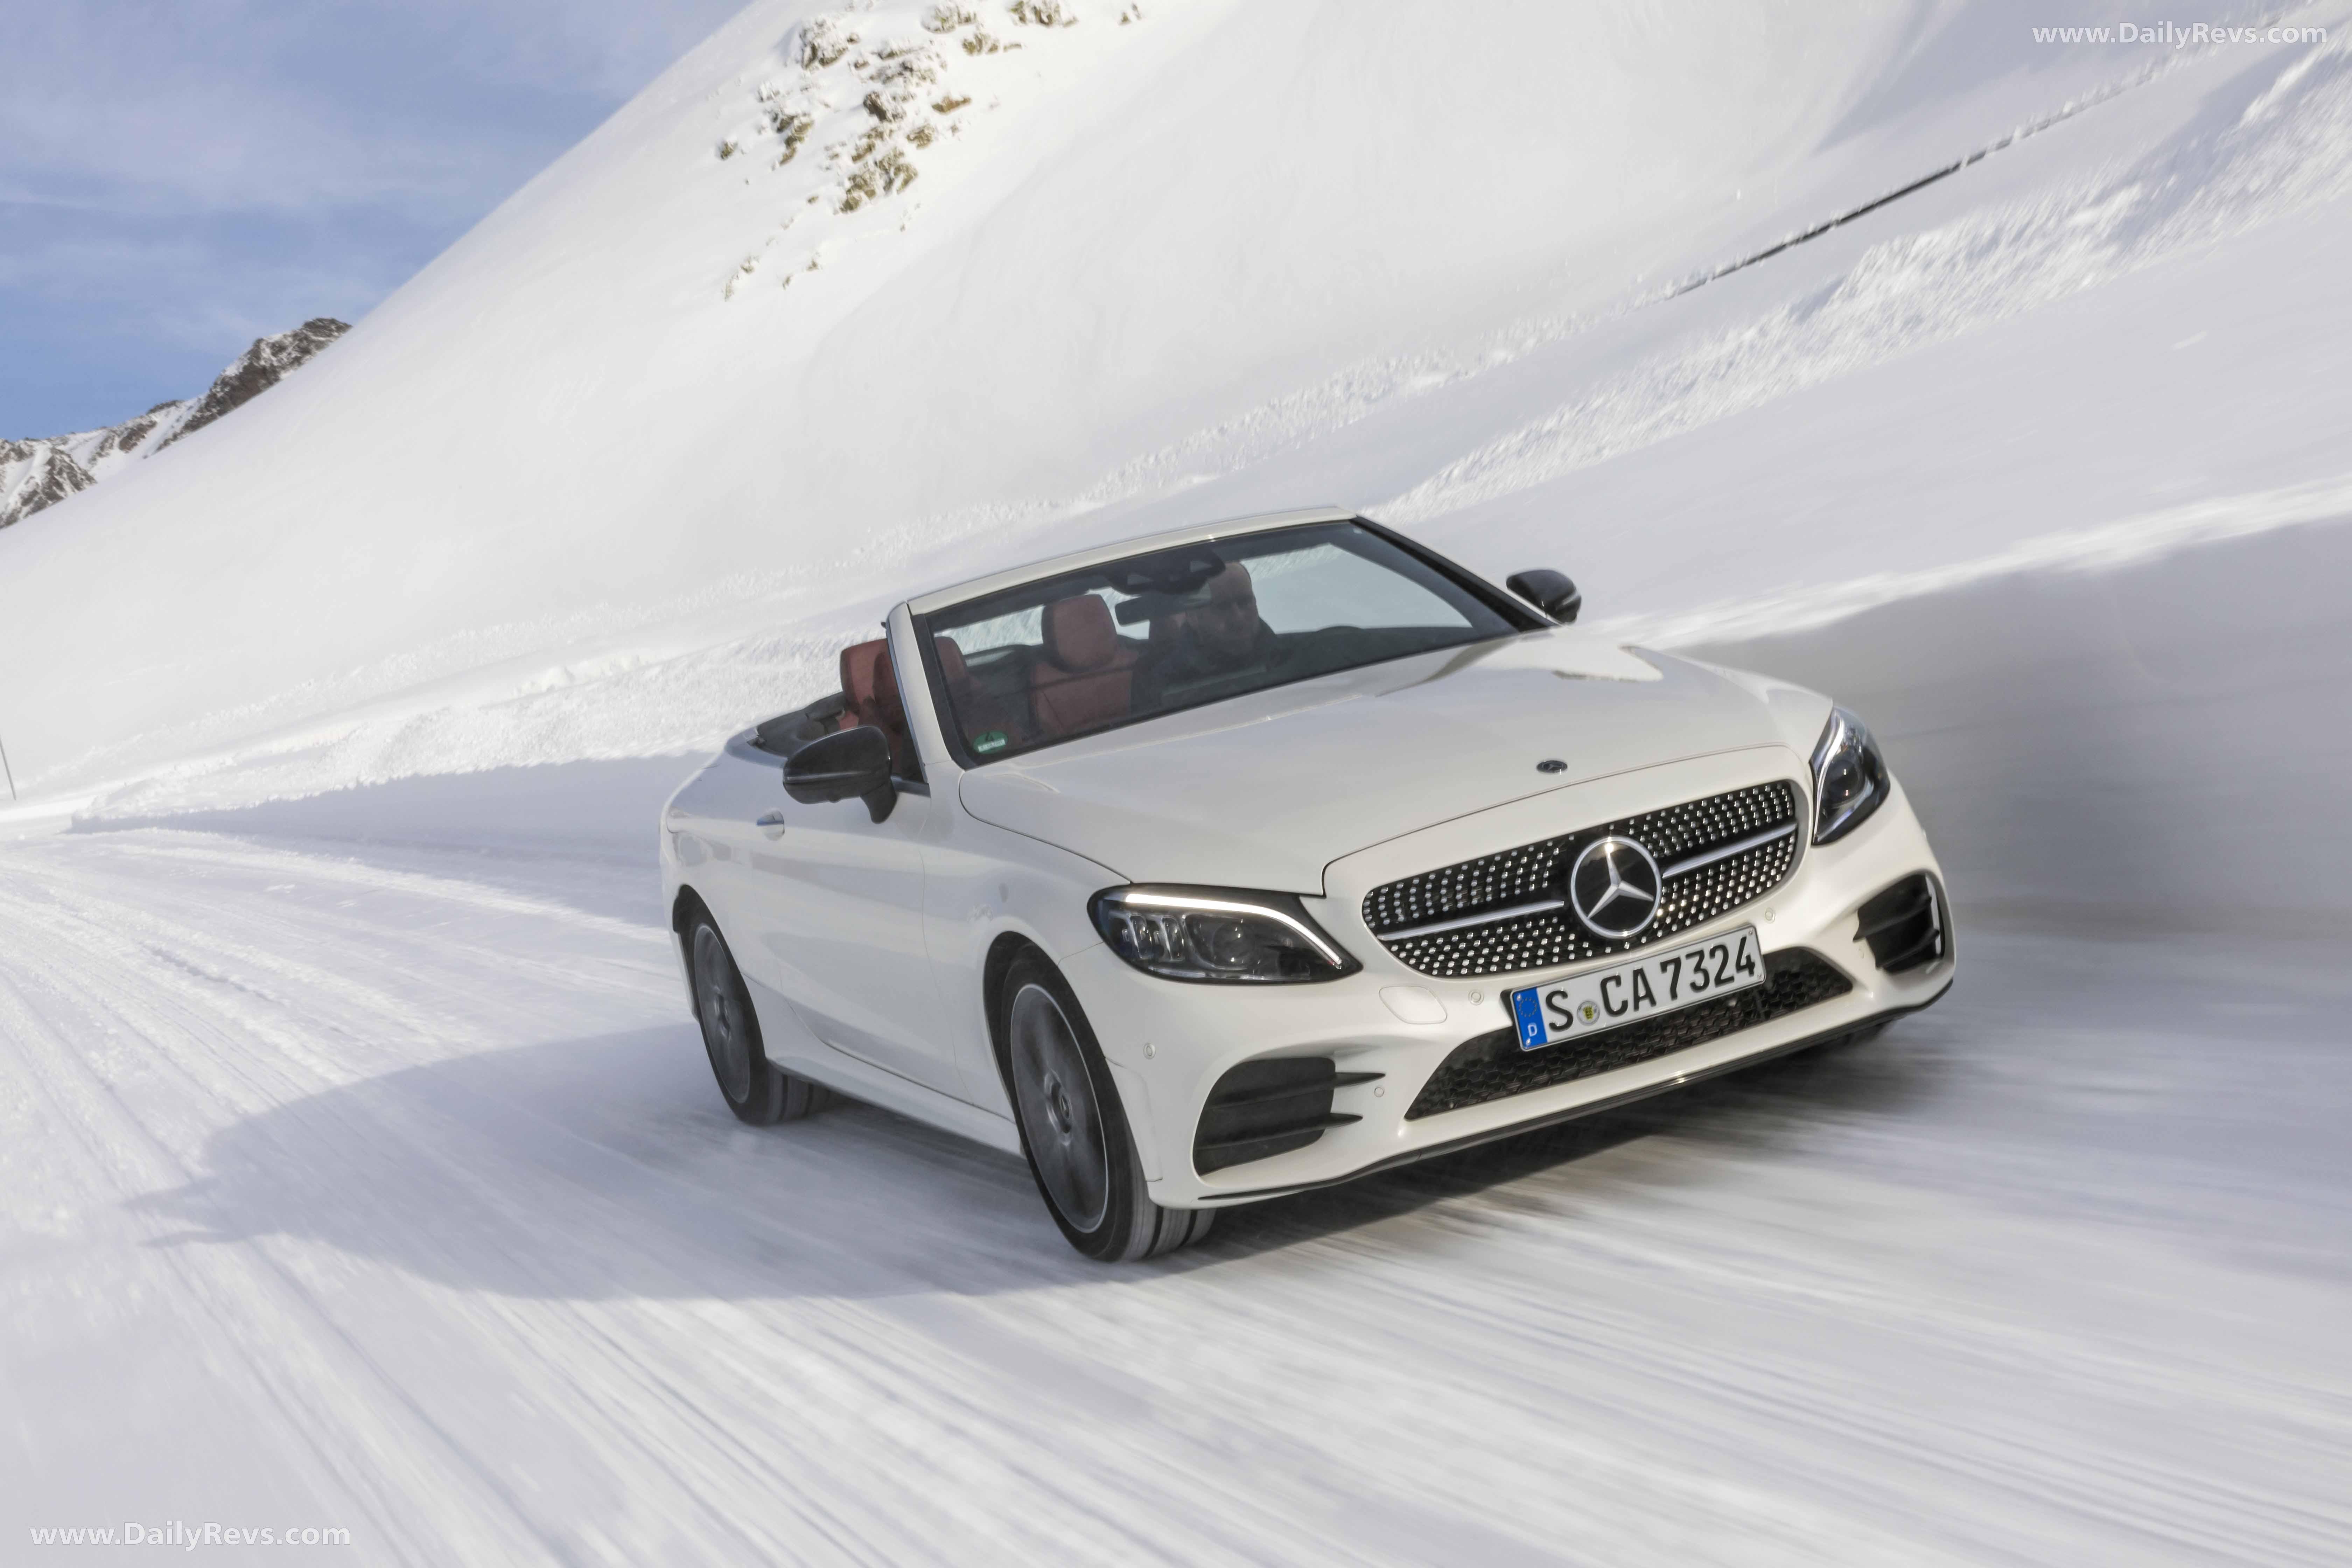 2019 Mercedes-Benz C-Class Cabriolet - HD Pictures, Videos ...